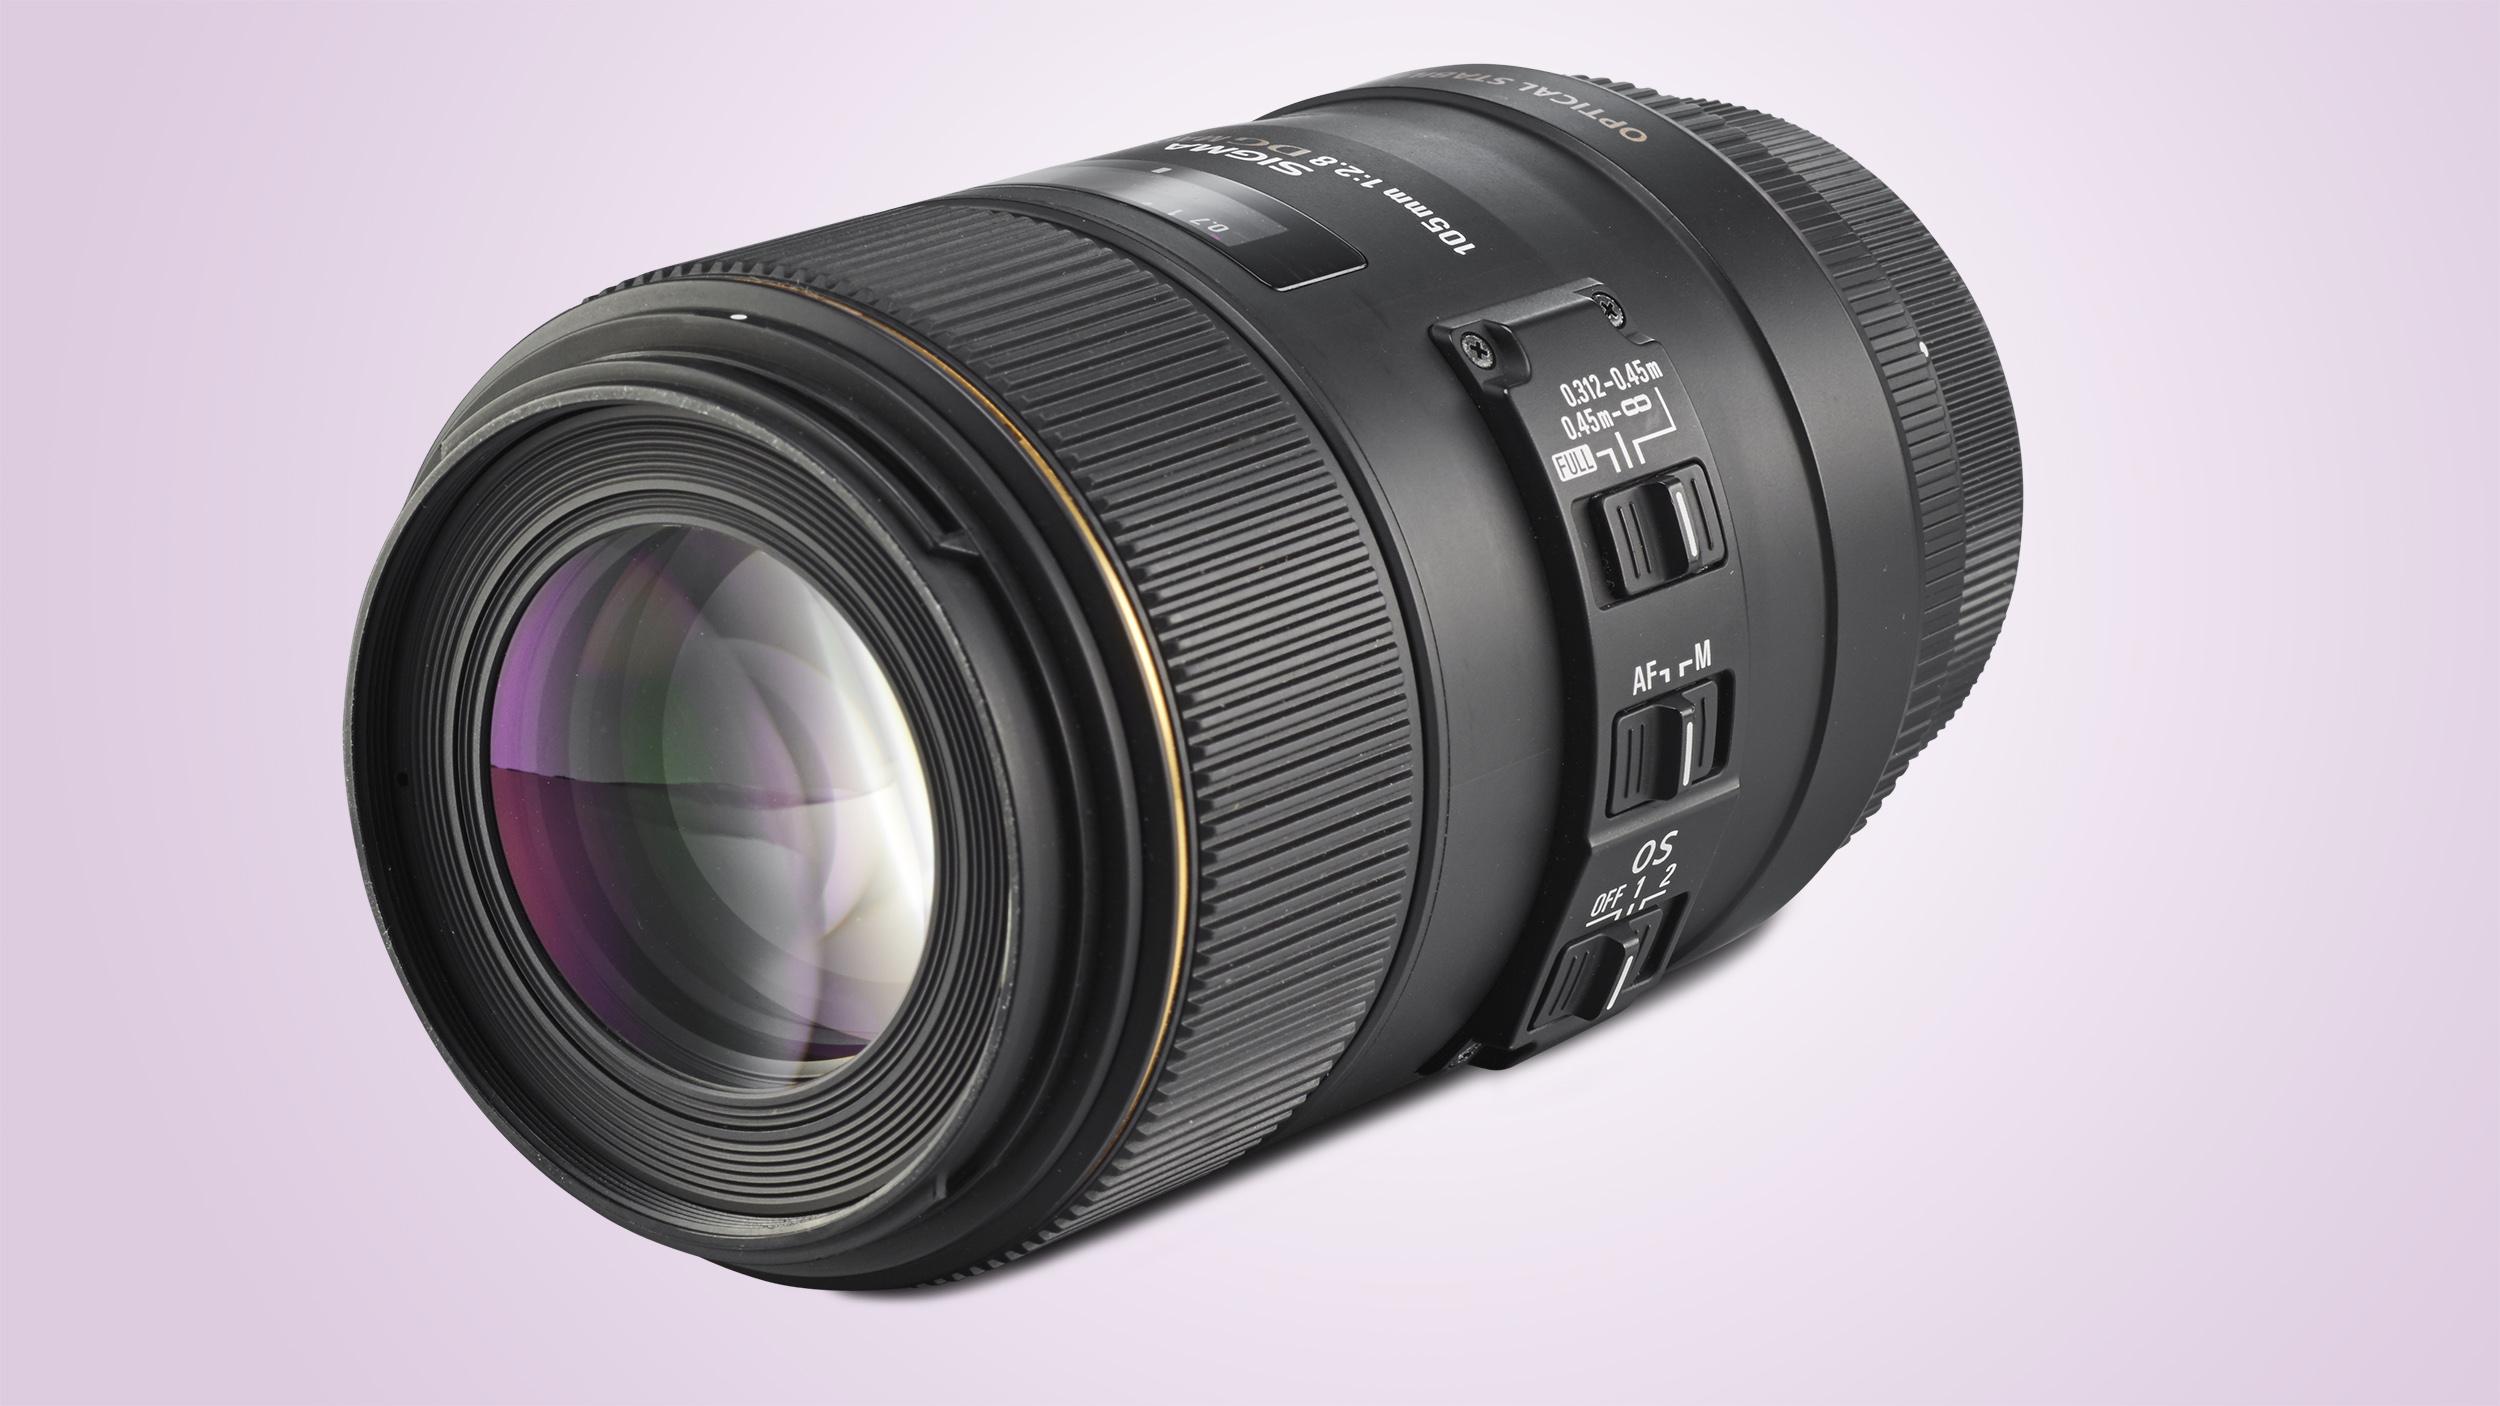 Sigma 105mm f/2.8 EX DG OS HSM Macro